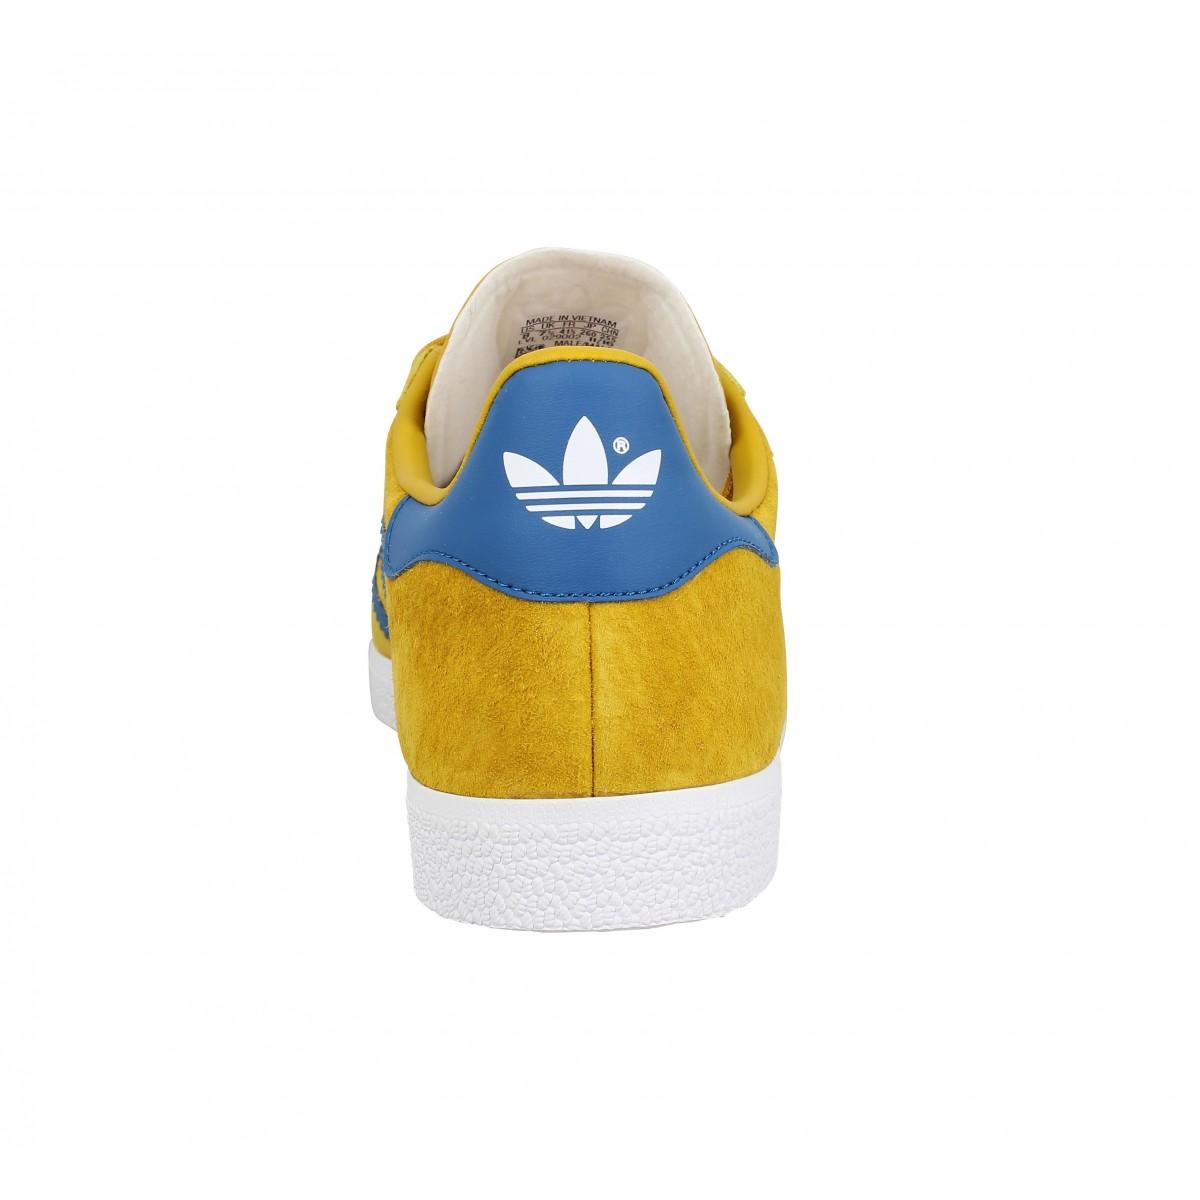 adidas gazelle jaune bleu